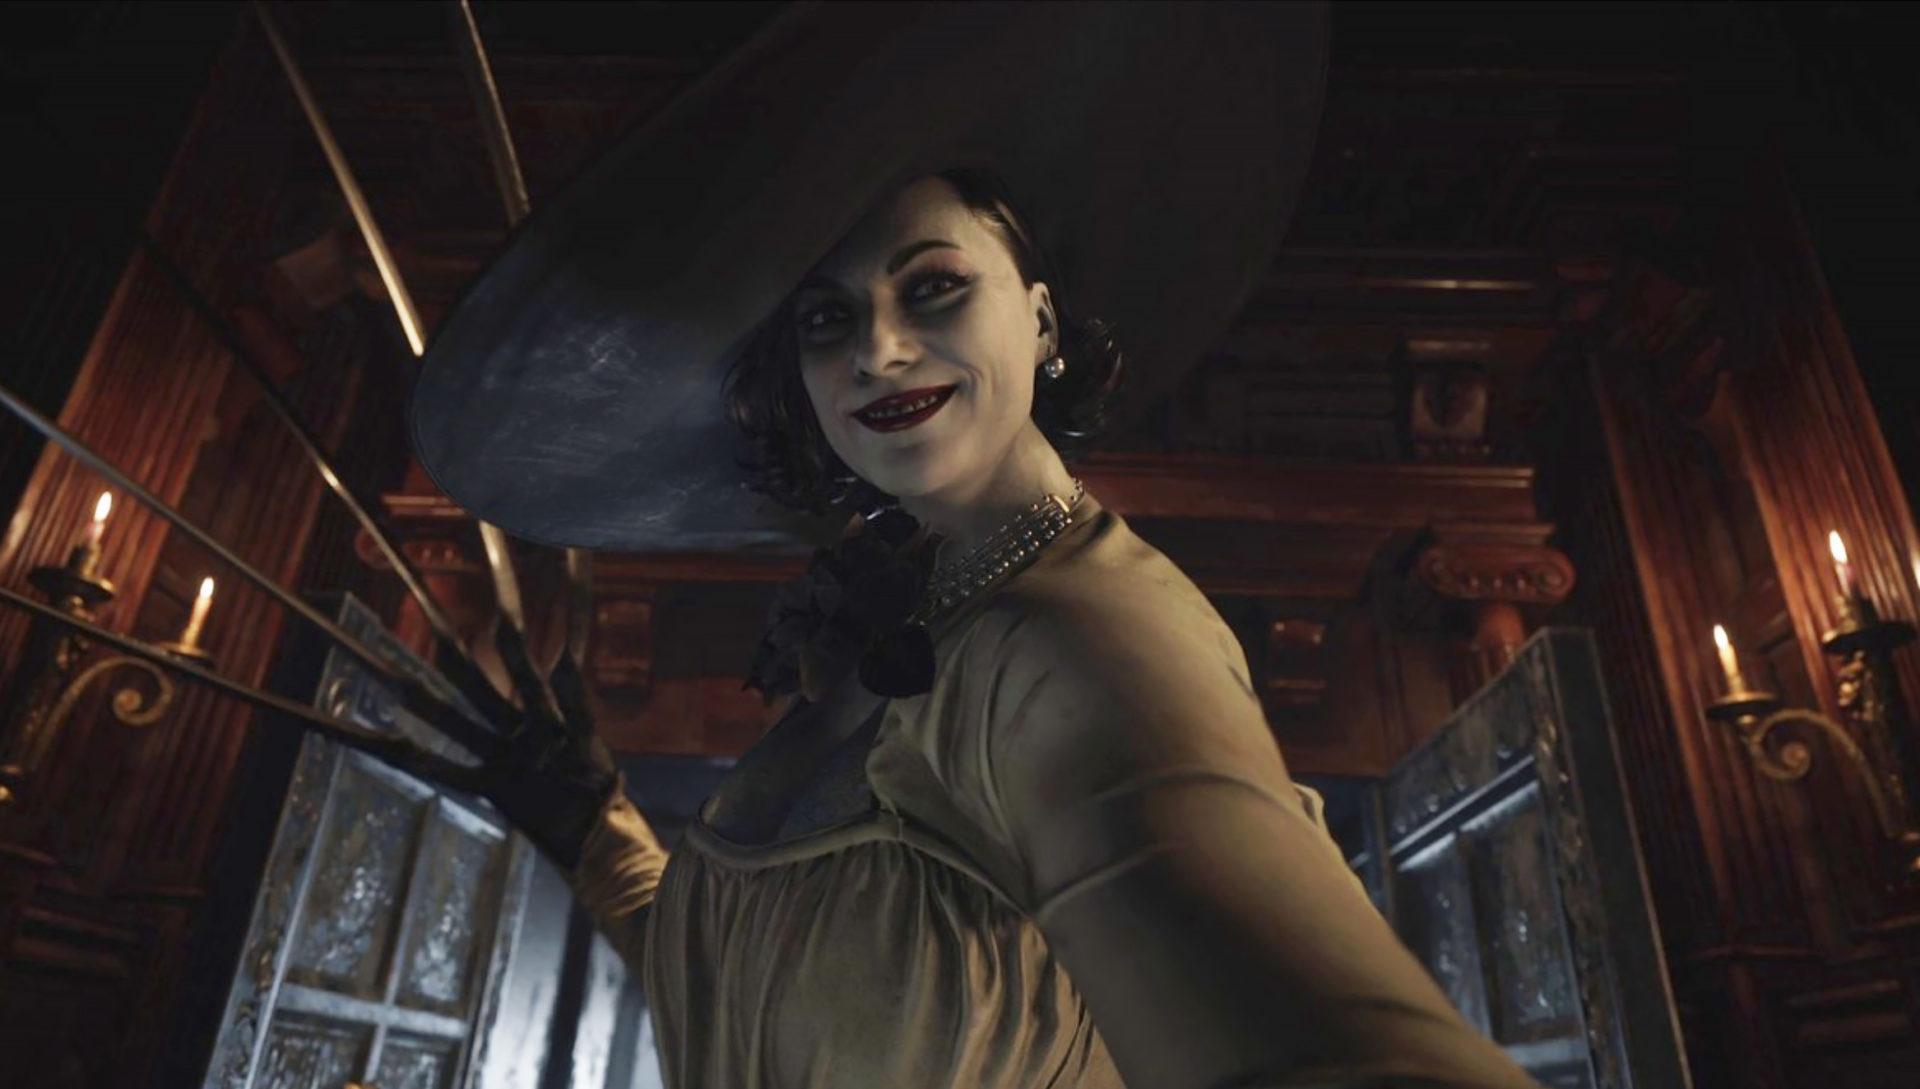 Screenshot of Alcina Dimitrescu in Resident Evil Village trailer.